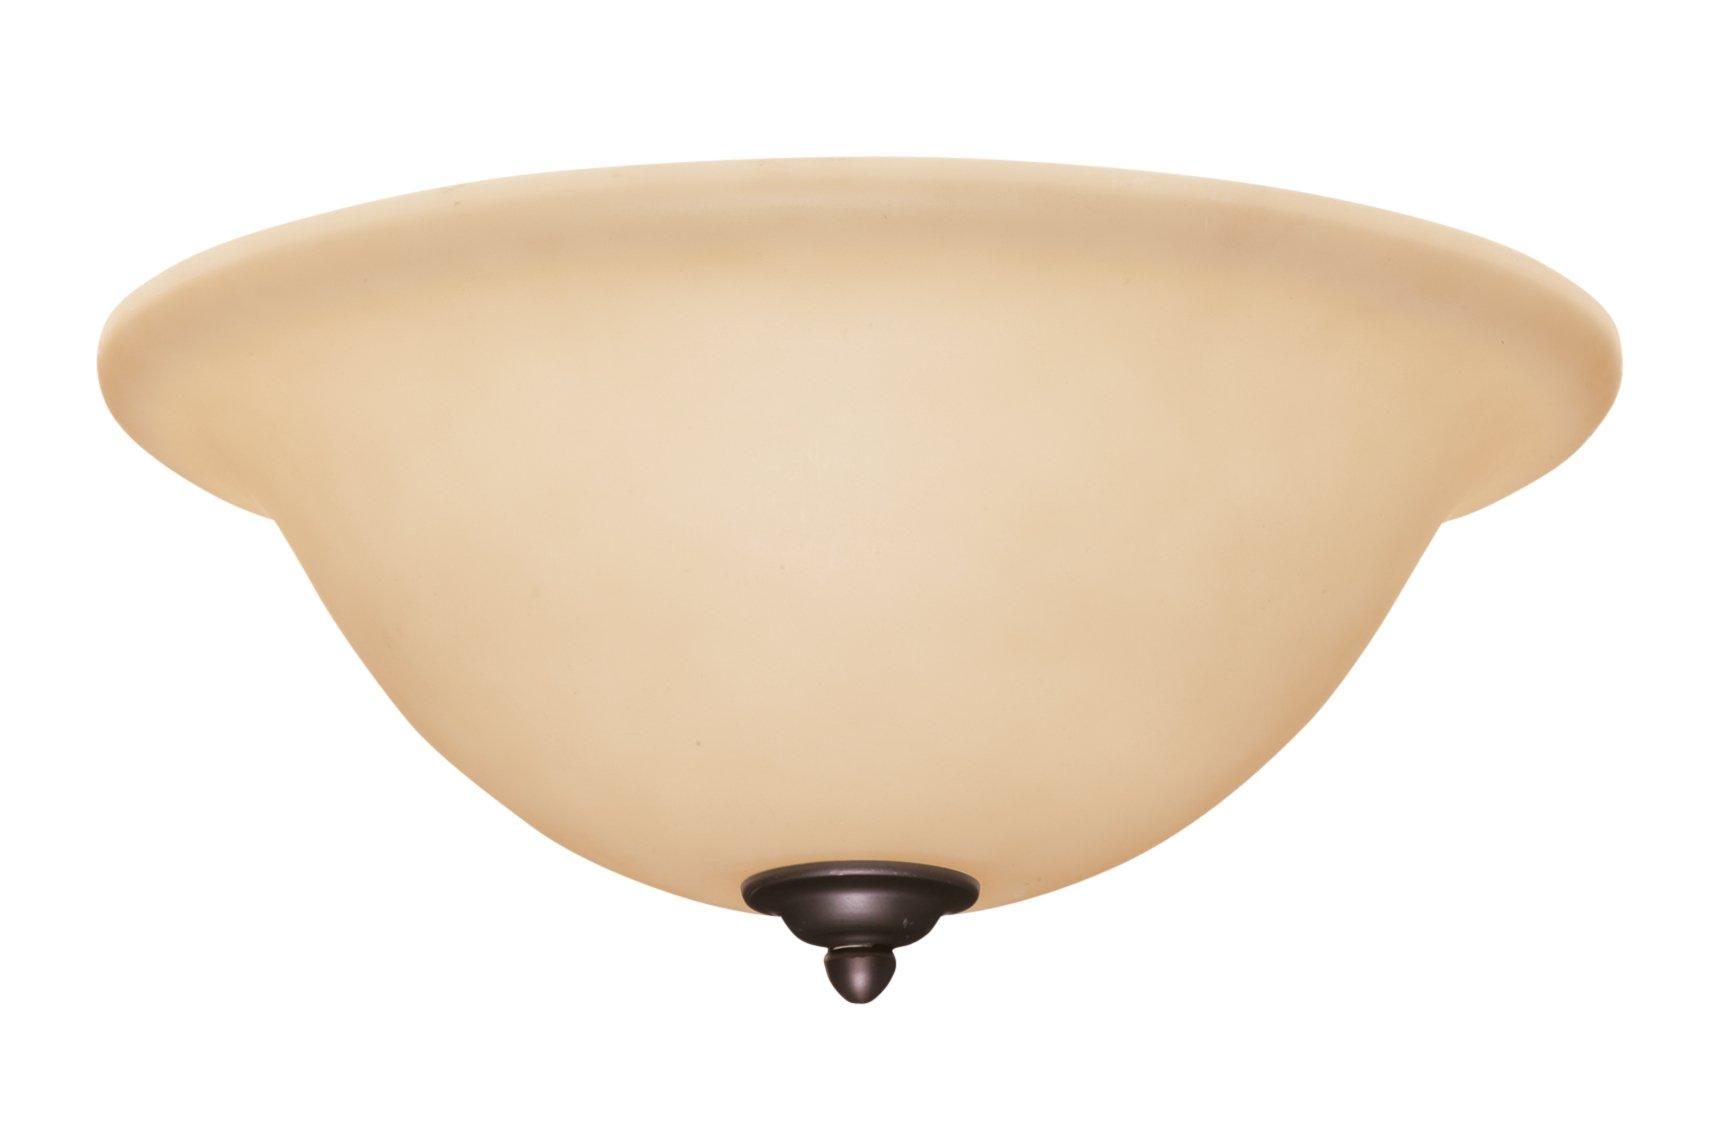 Emerson Ceiling Fans LK72VNB Amber Scavo Light Fixture for Ceiling Fans, Medium Base CFL